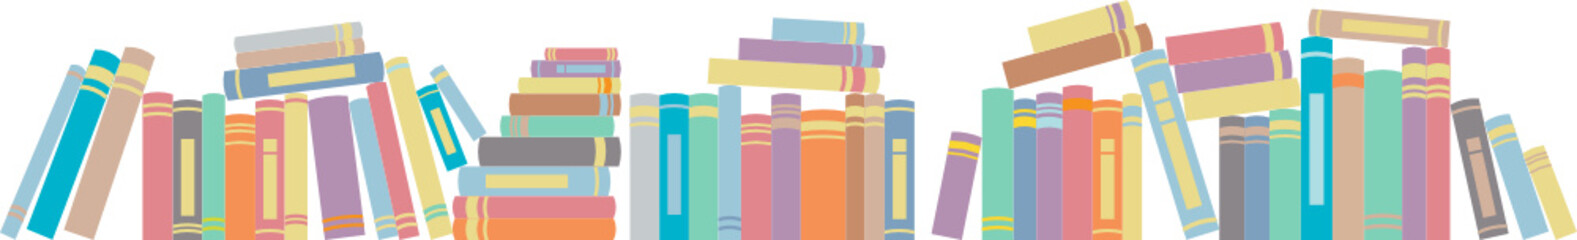 Books in horizontal line